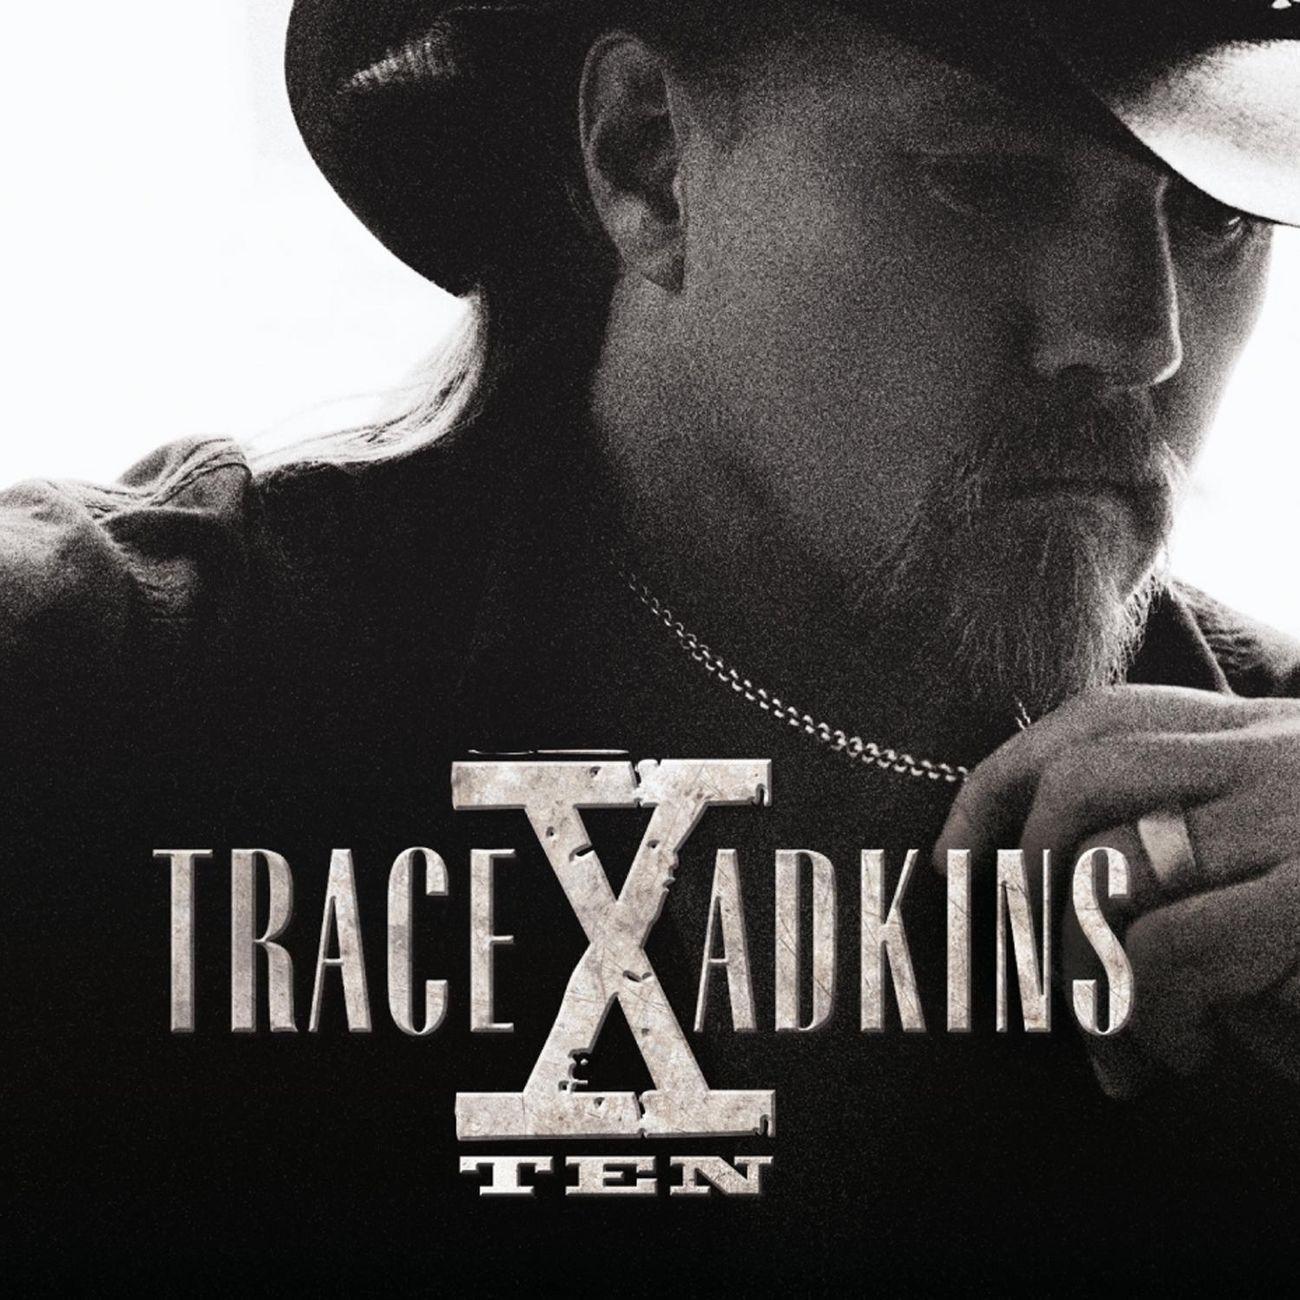 Trace Adkins, X